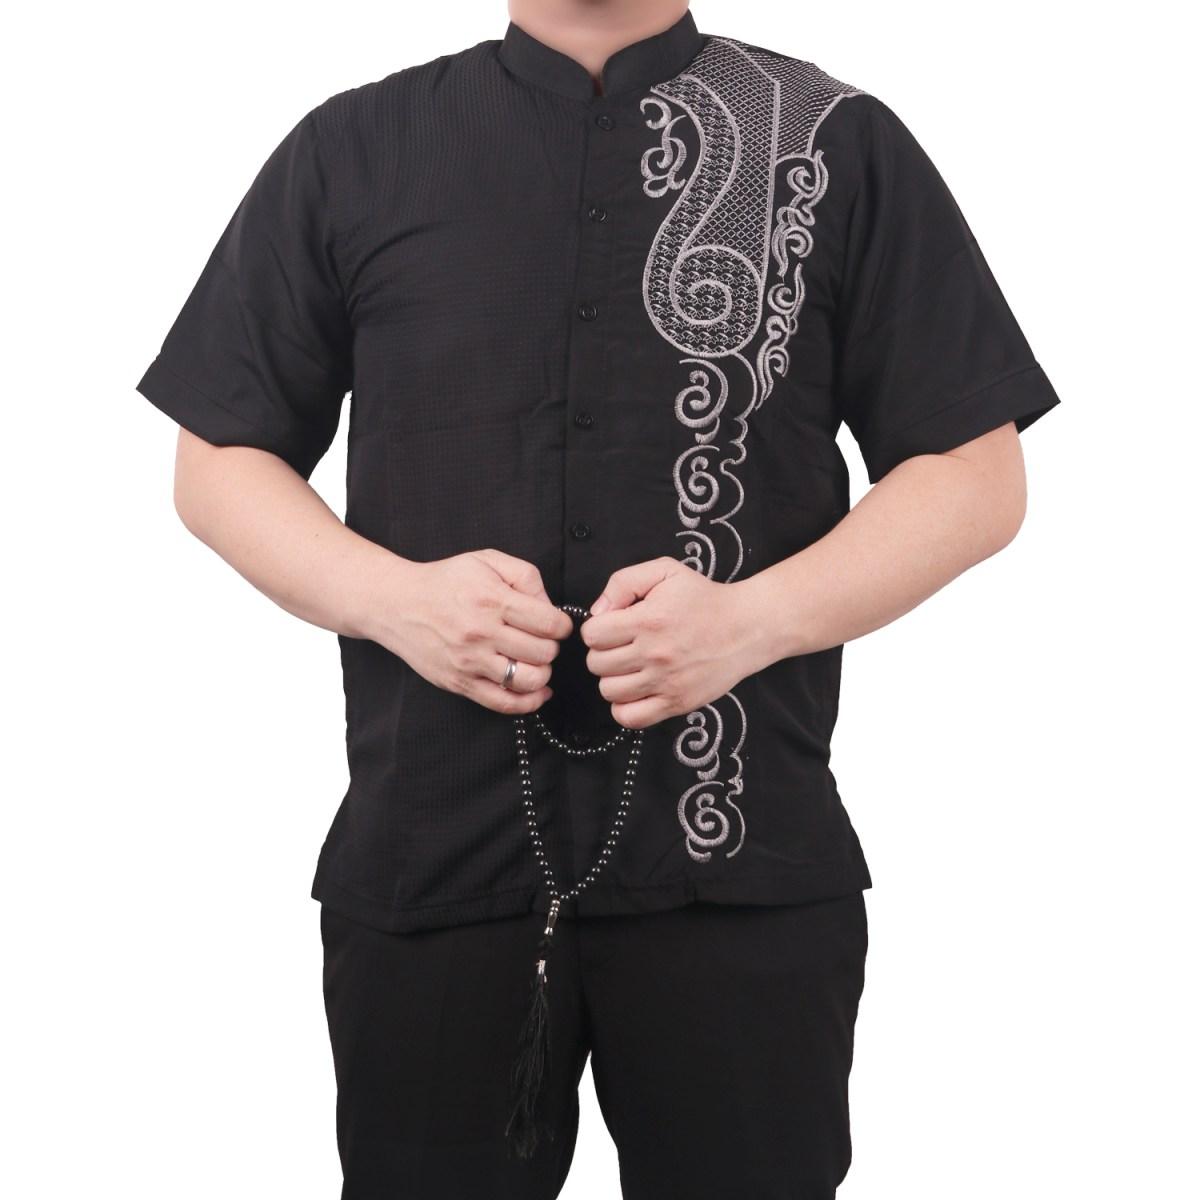 Baju Koko5 Muslim BORDIR Kombinasi Batik 2019 FREE Sandal Jepit Navy L 14